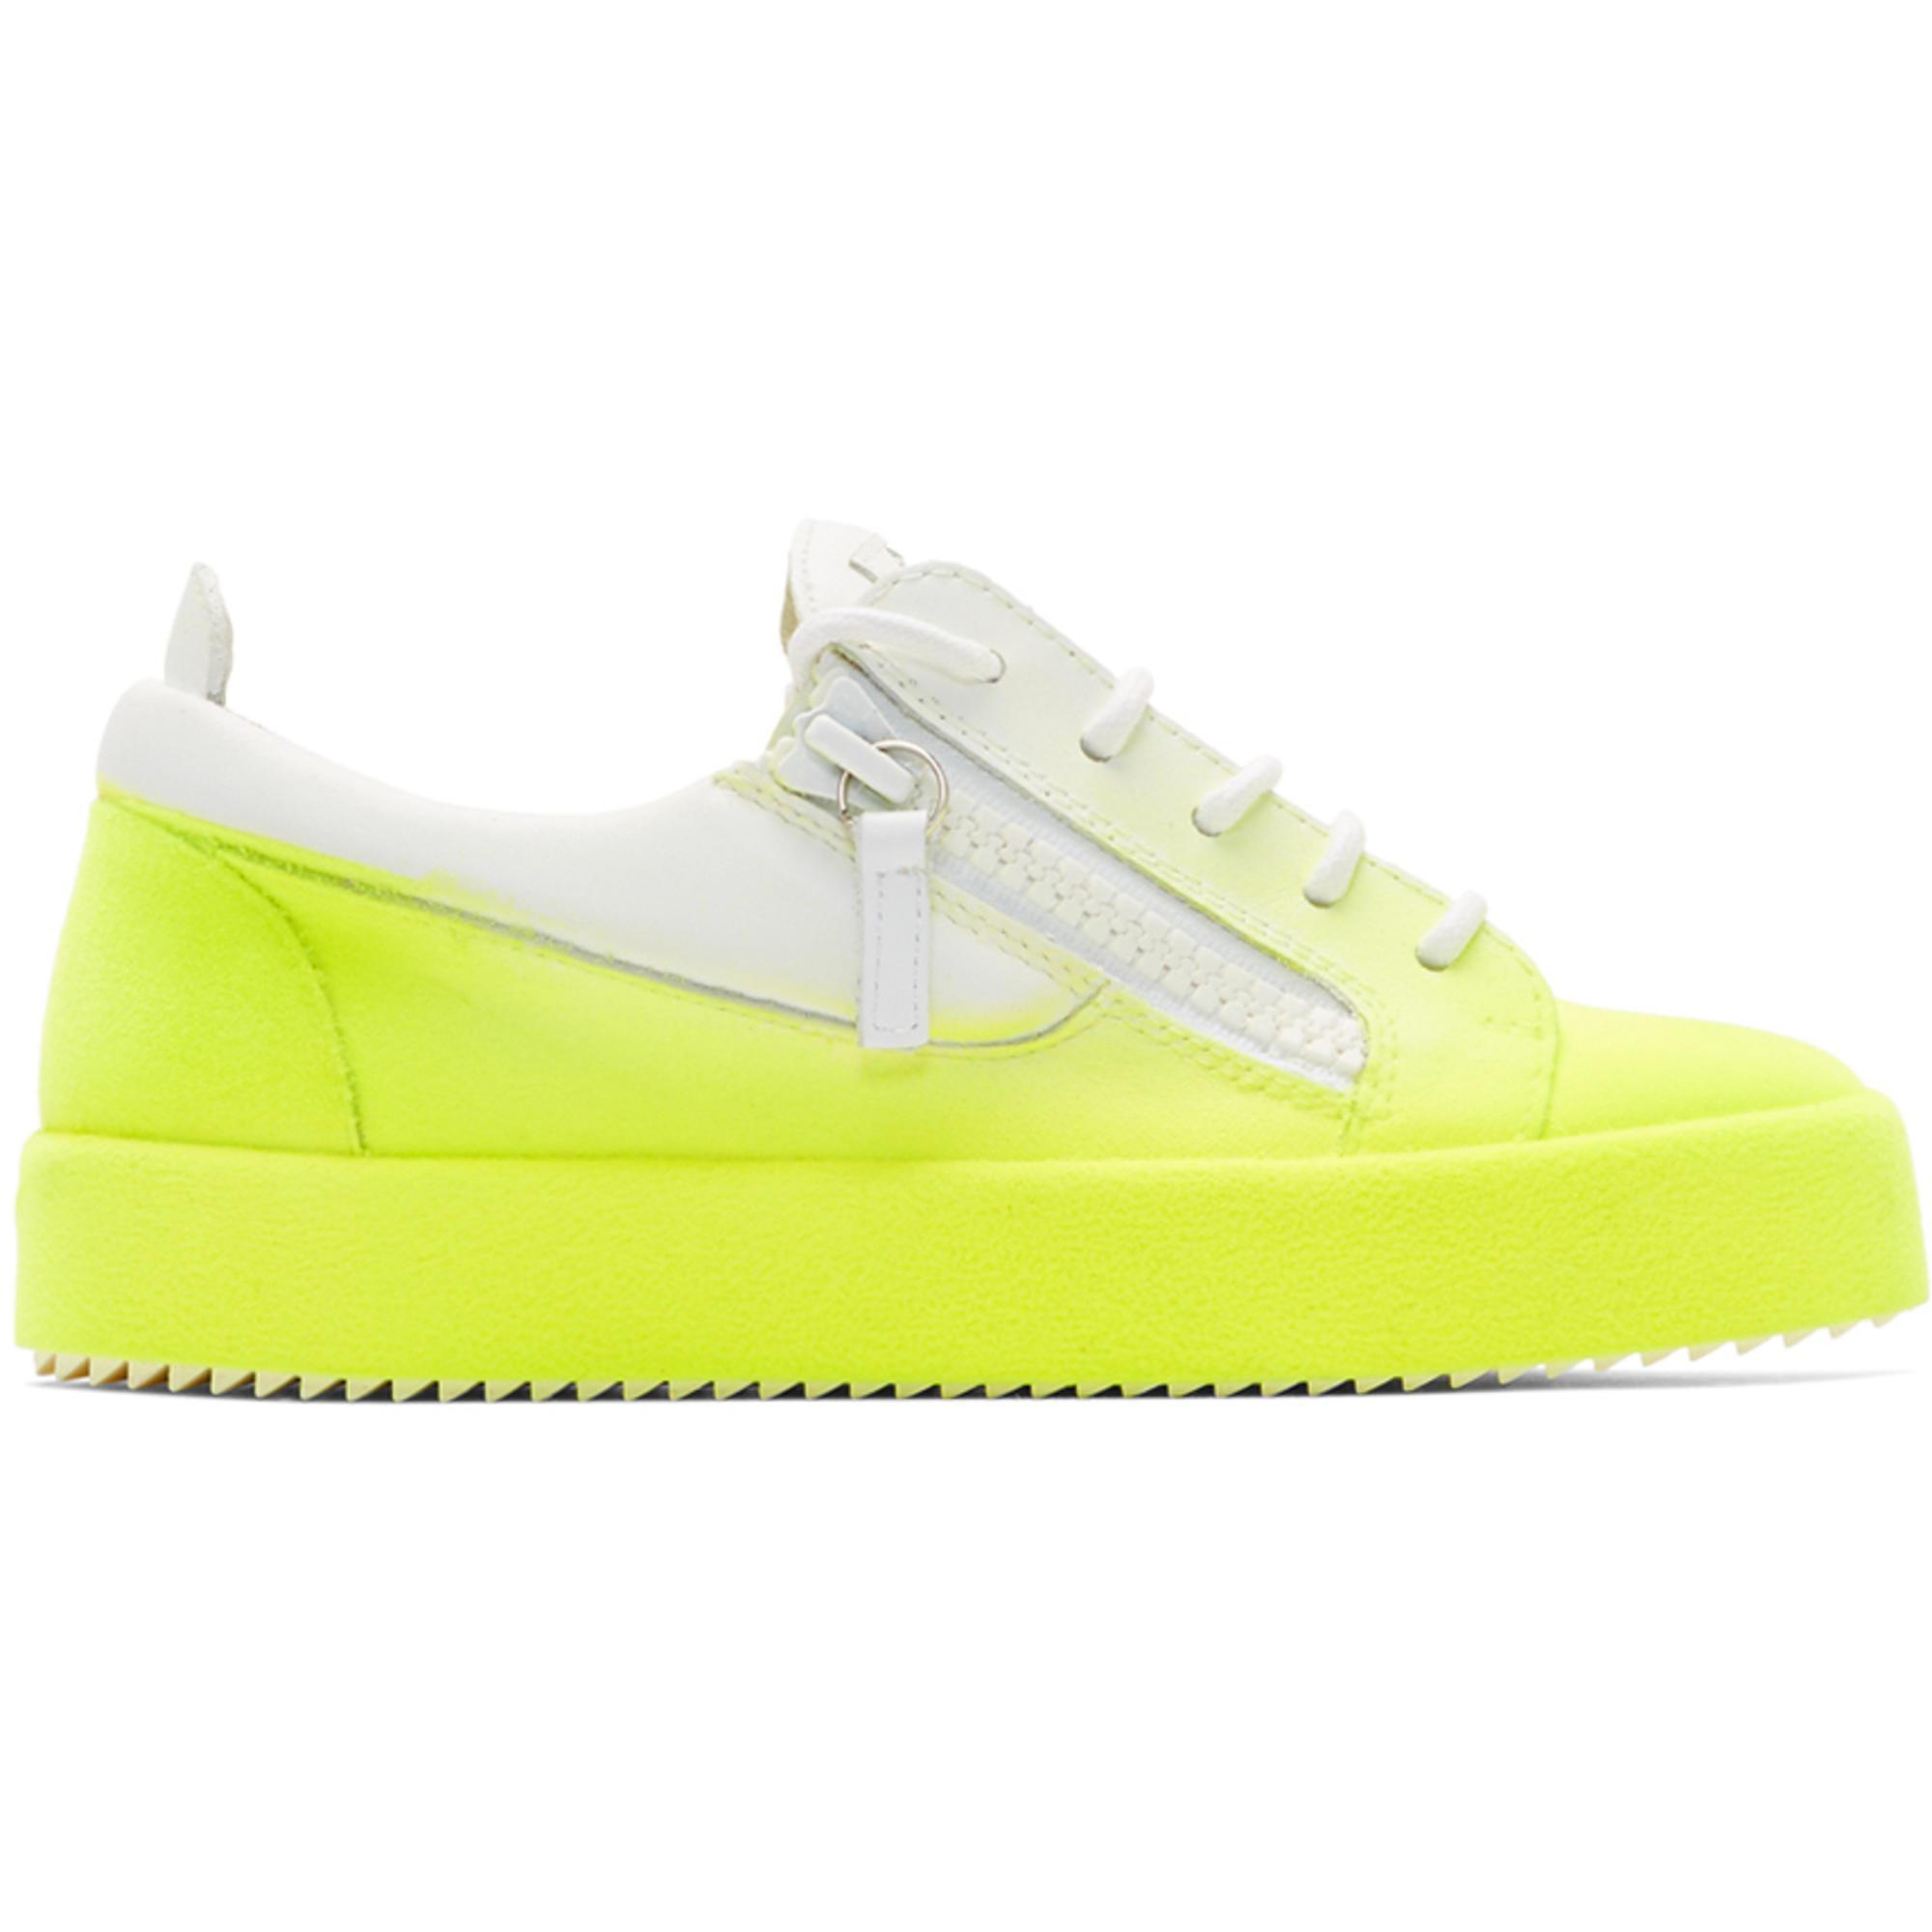 Giuseppe Zanotti White & Yellow Flashy May London Sneakers OQB66uy9co